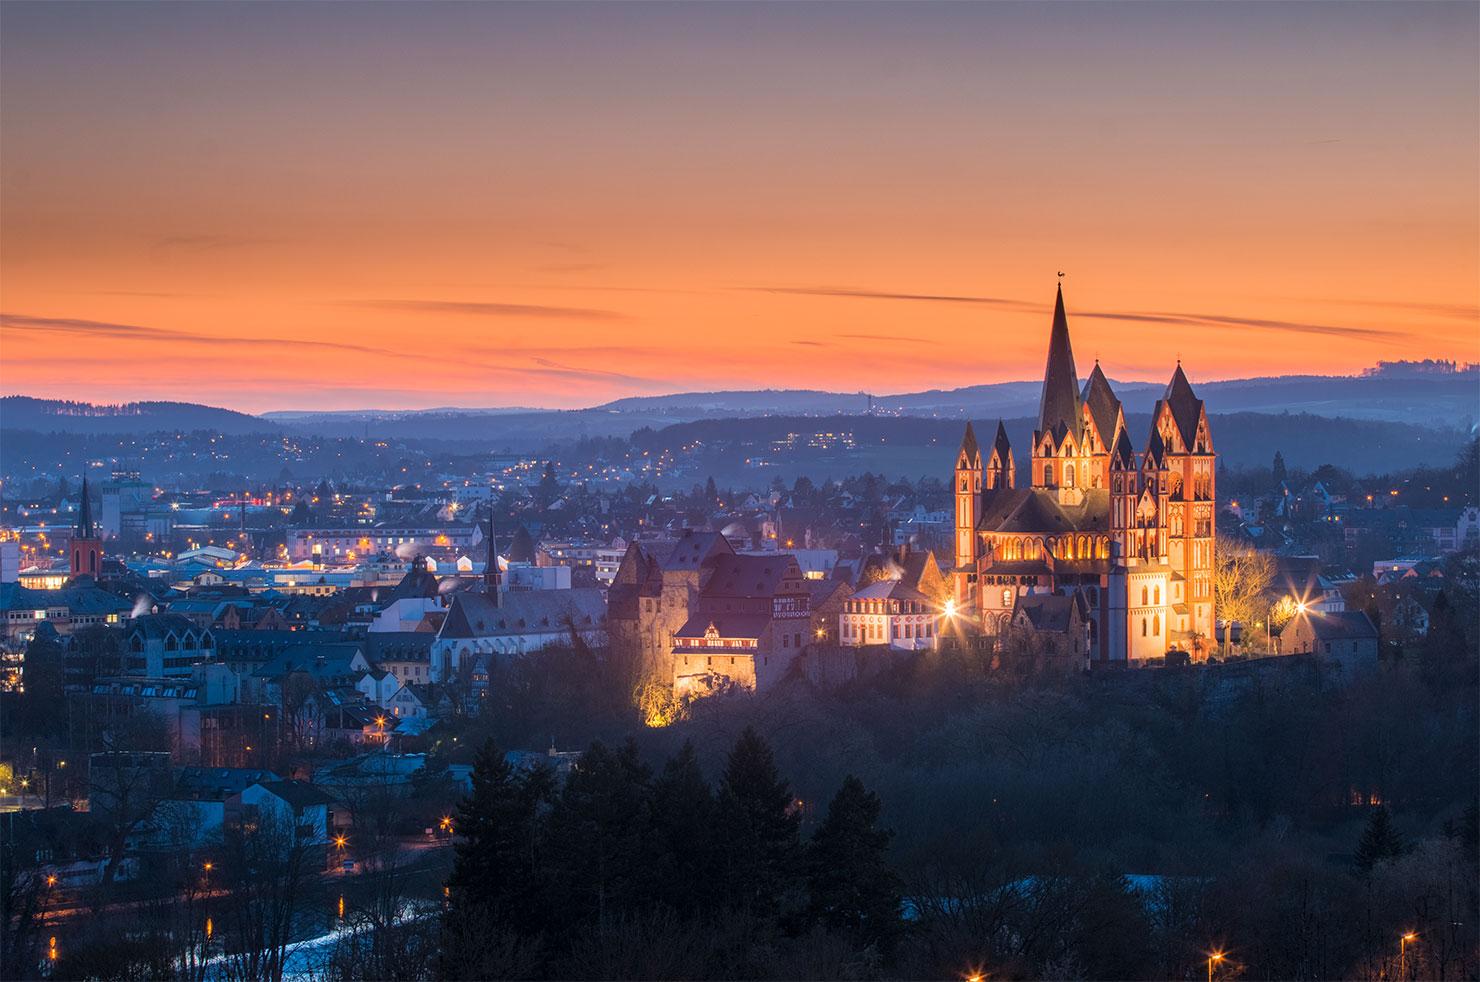 limburg-stadtansicht-sonnenuntergang_v2_1480px